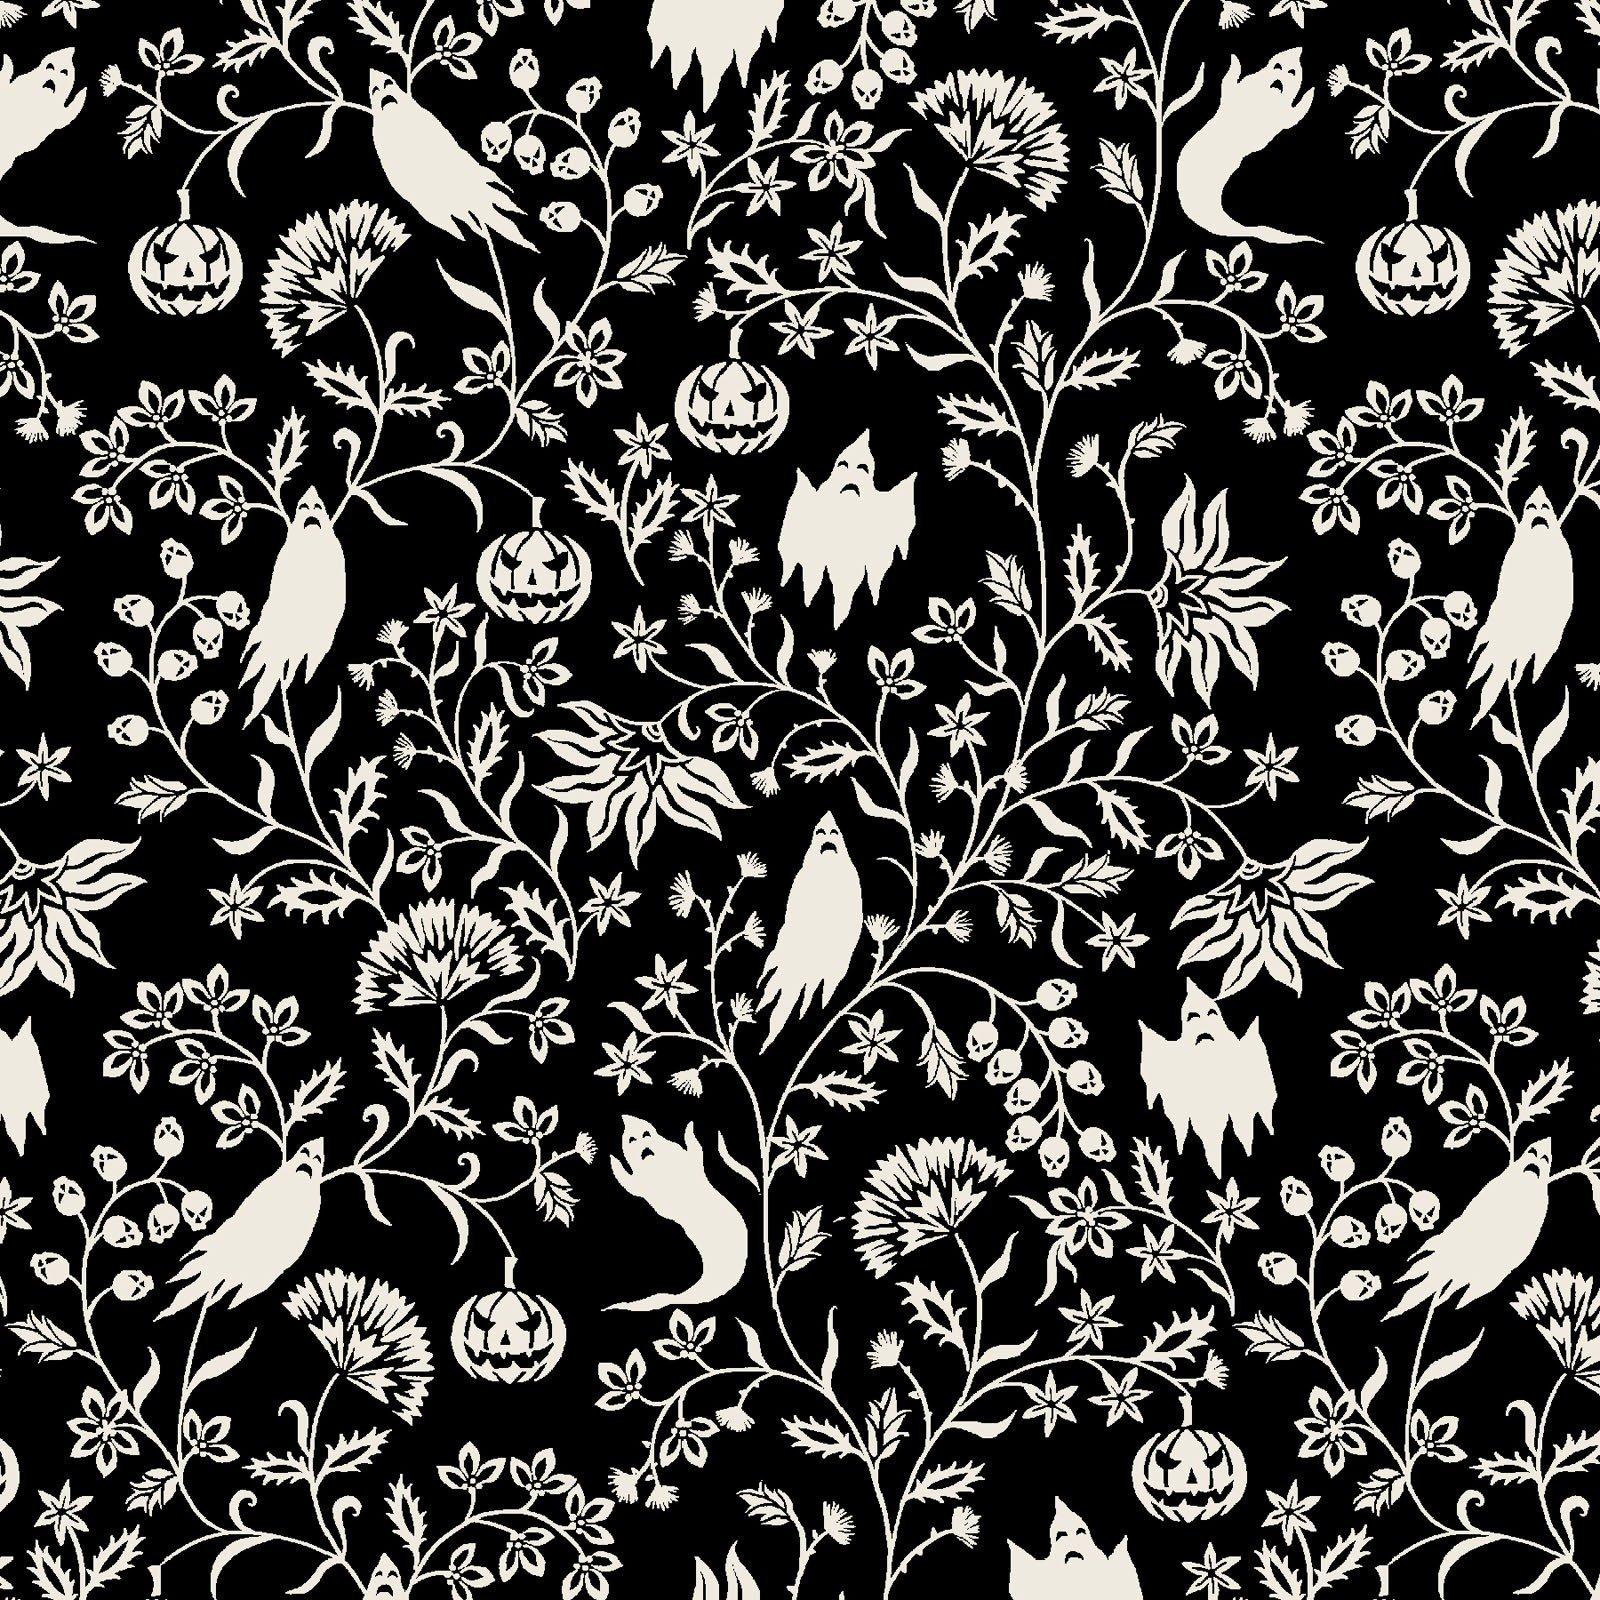 Black -Ghostly Vine -  Harvest Moon by Grace Popp - SEF5249-99